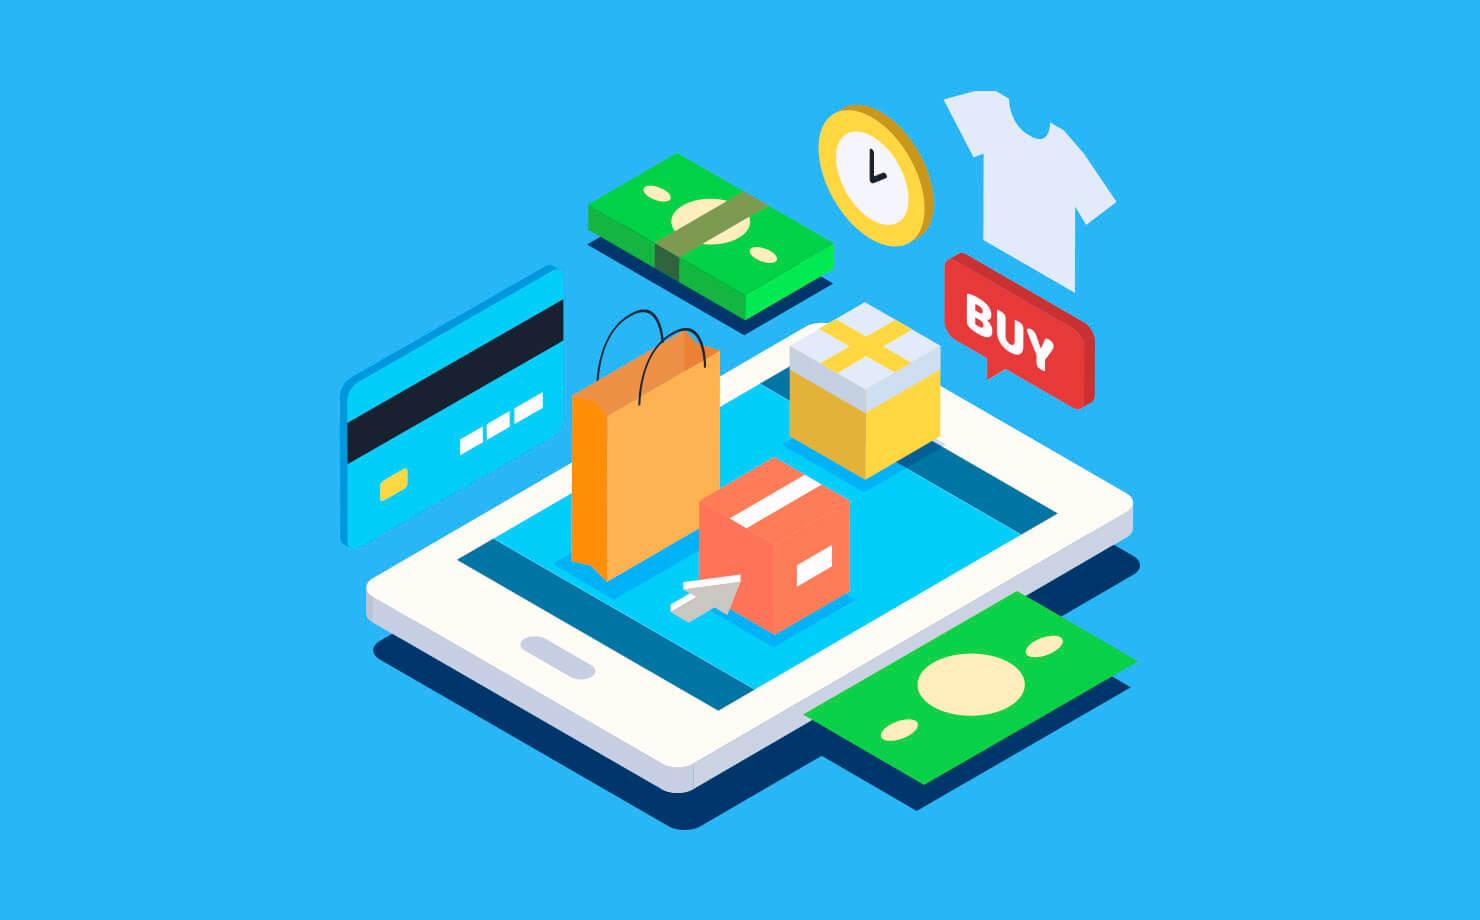 Retail software types